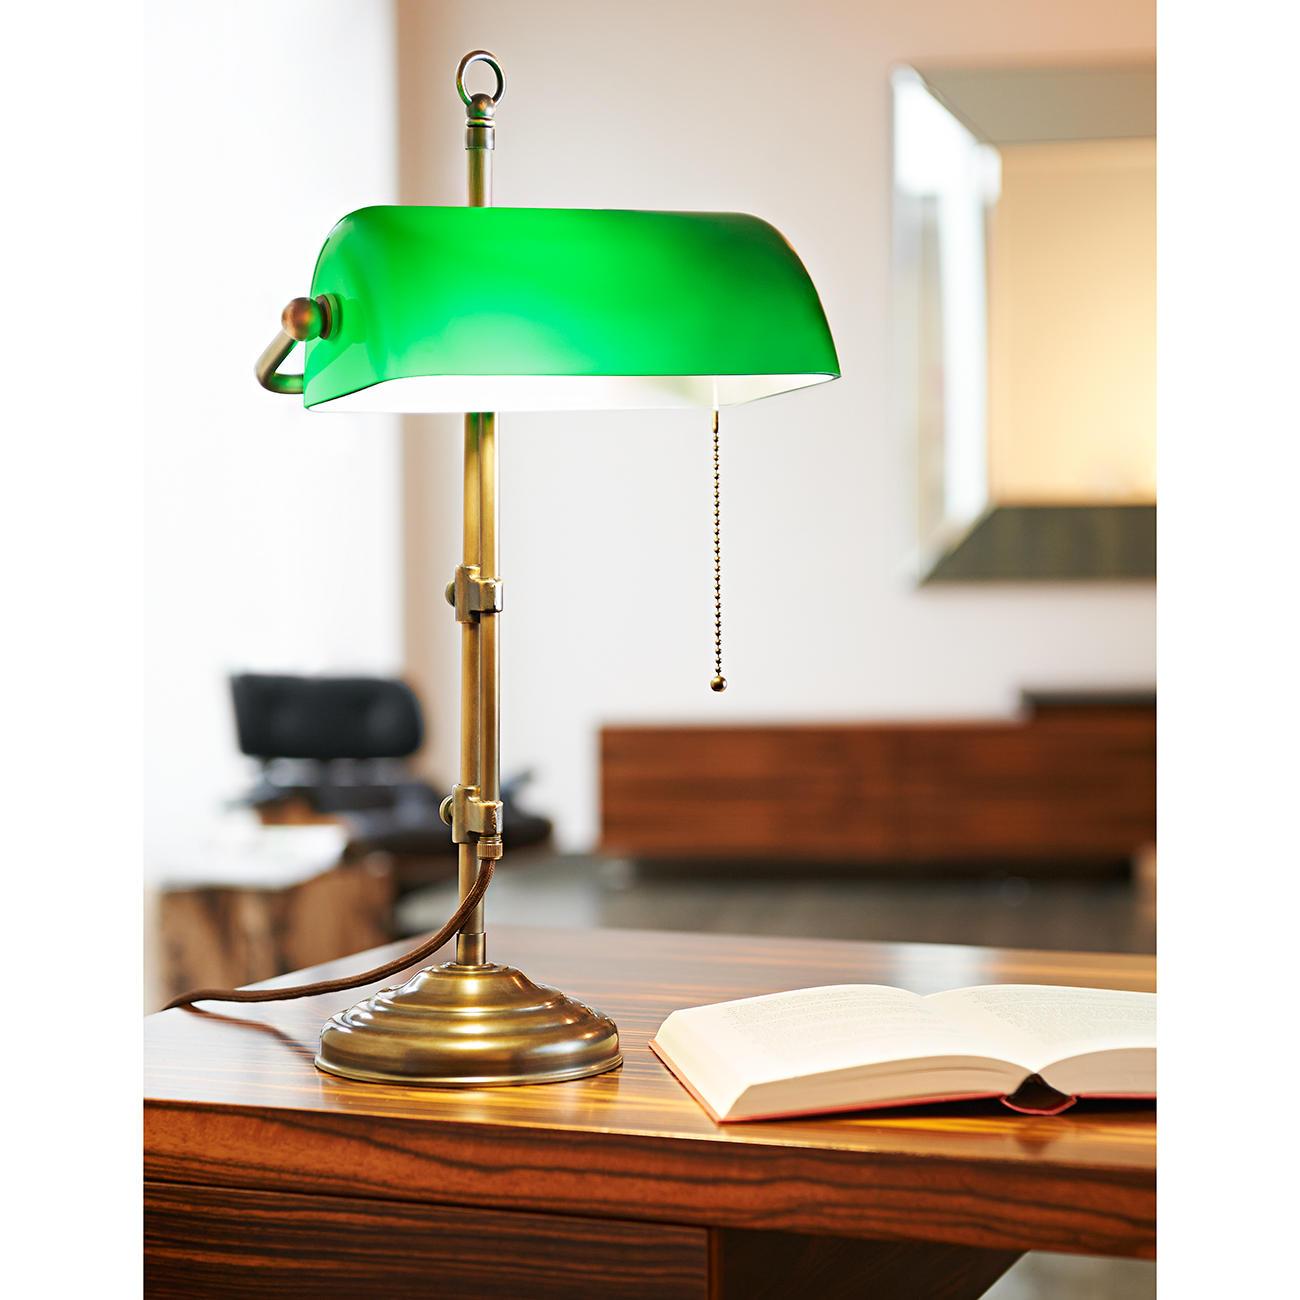 messing banker s lamp 3 jahre garantie pro idee. Black Bedroom Furniture Sets. Home Design Ideas